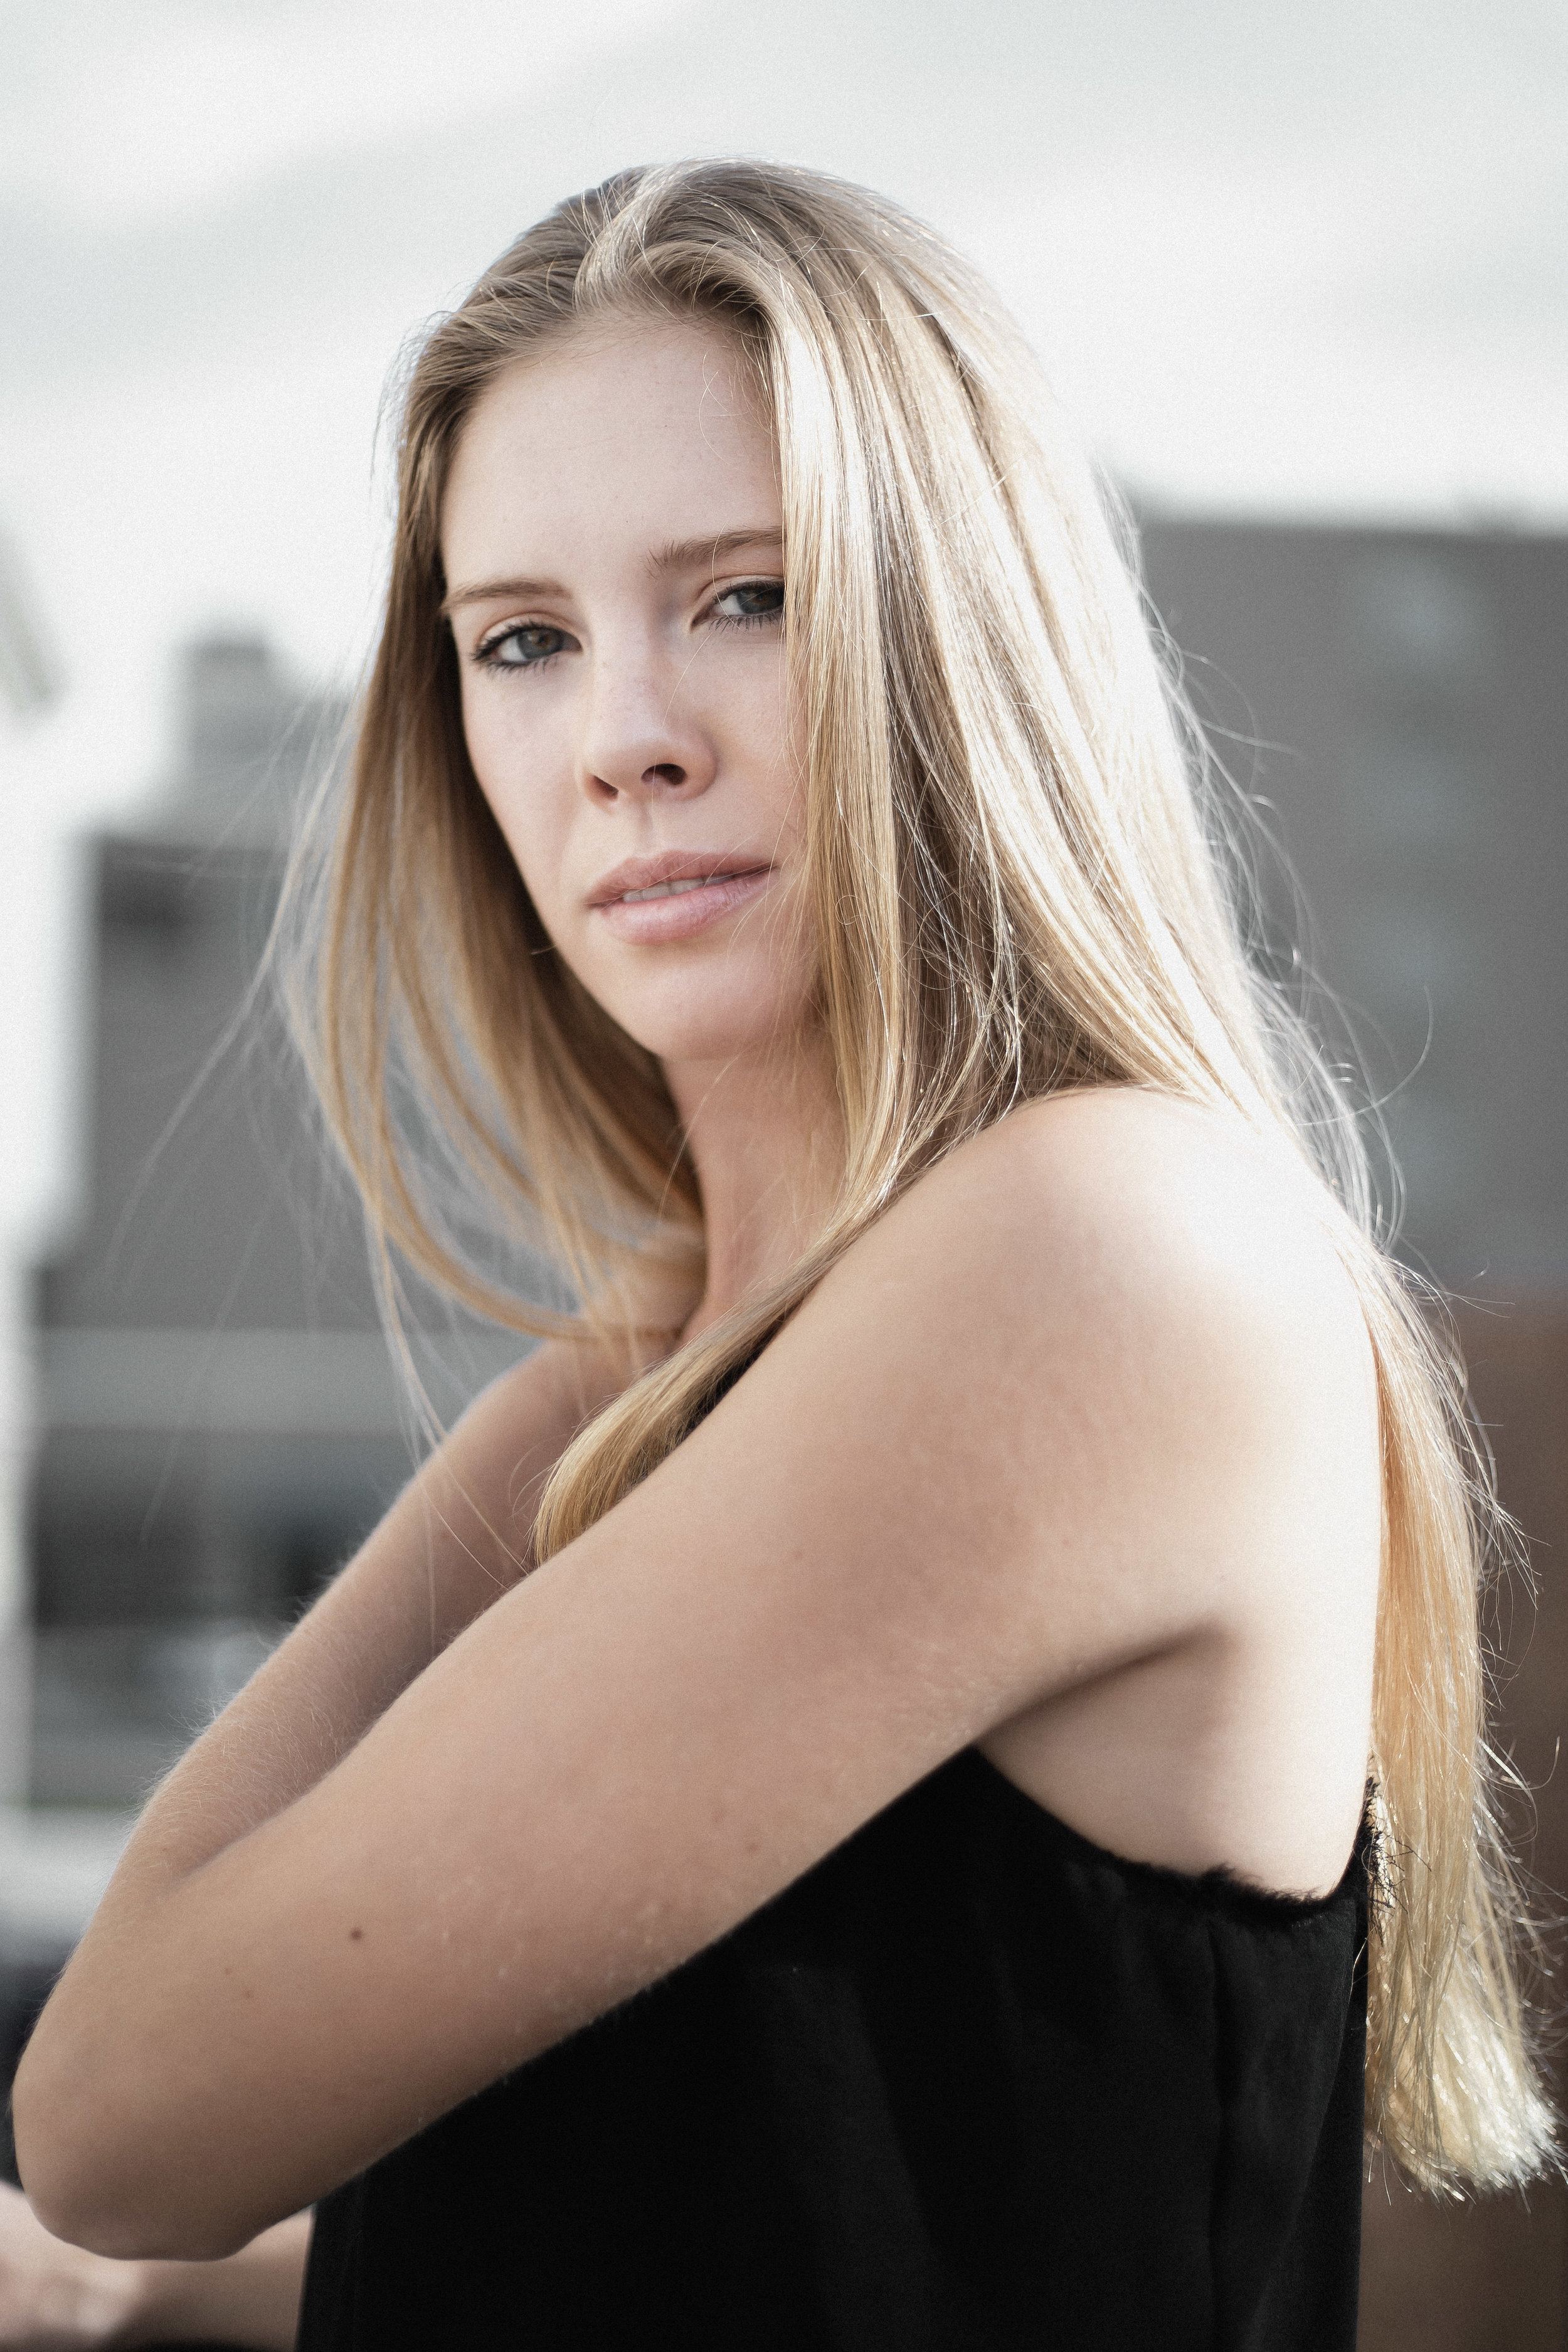 New face model photographer New York